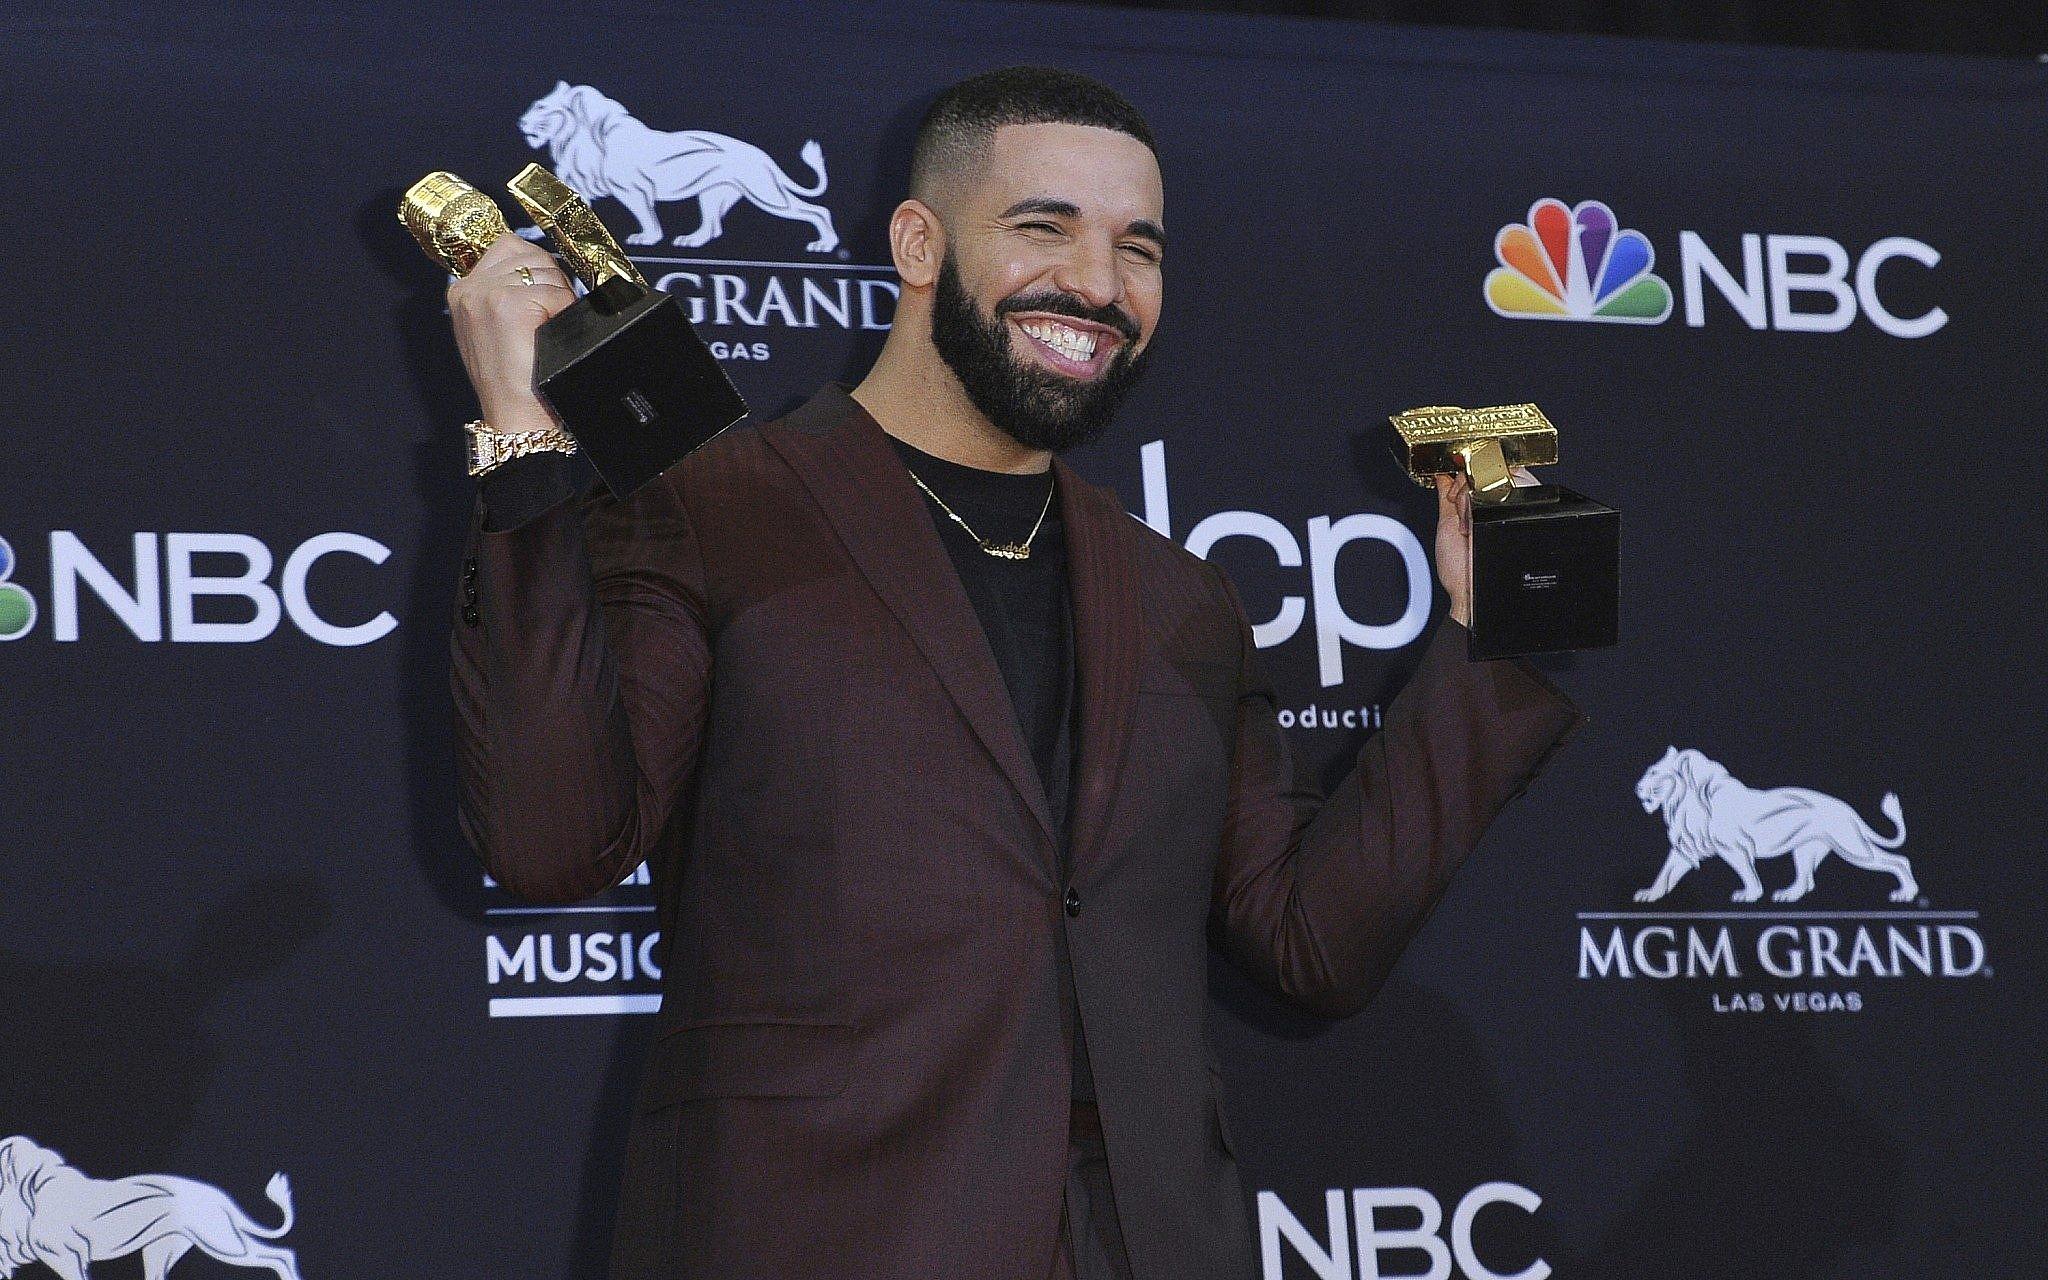 Drake raps 'I should probably go to yeshiva' on new single